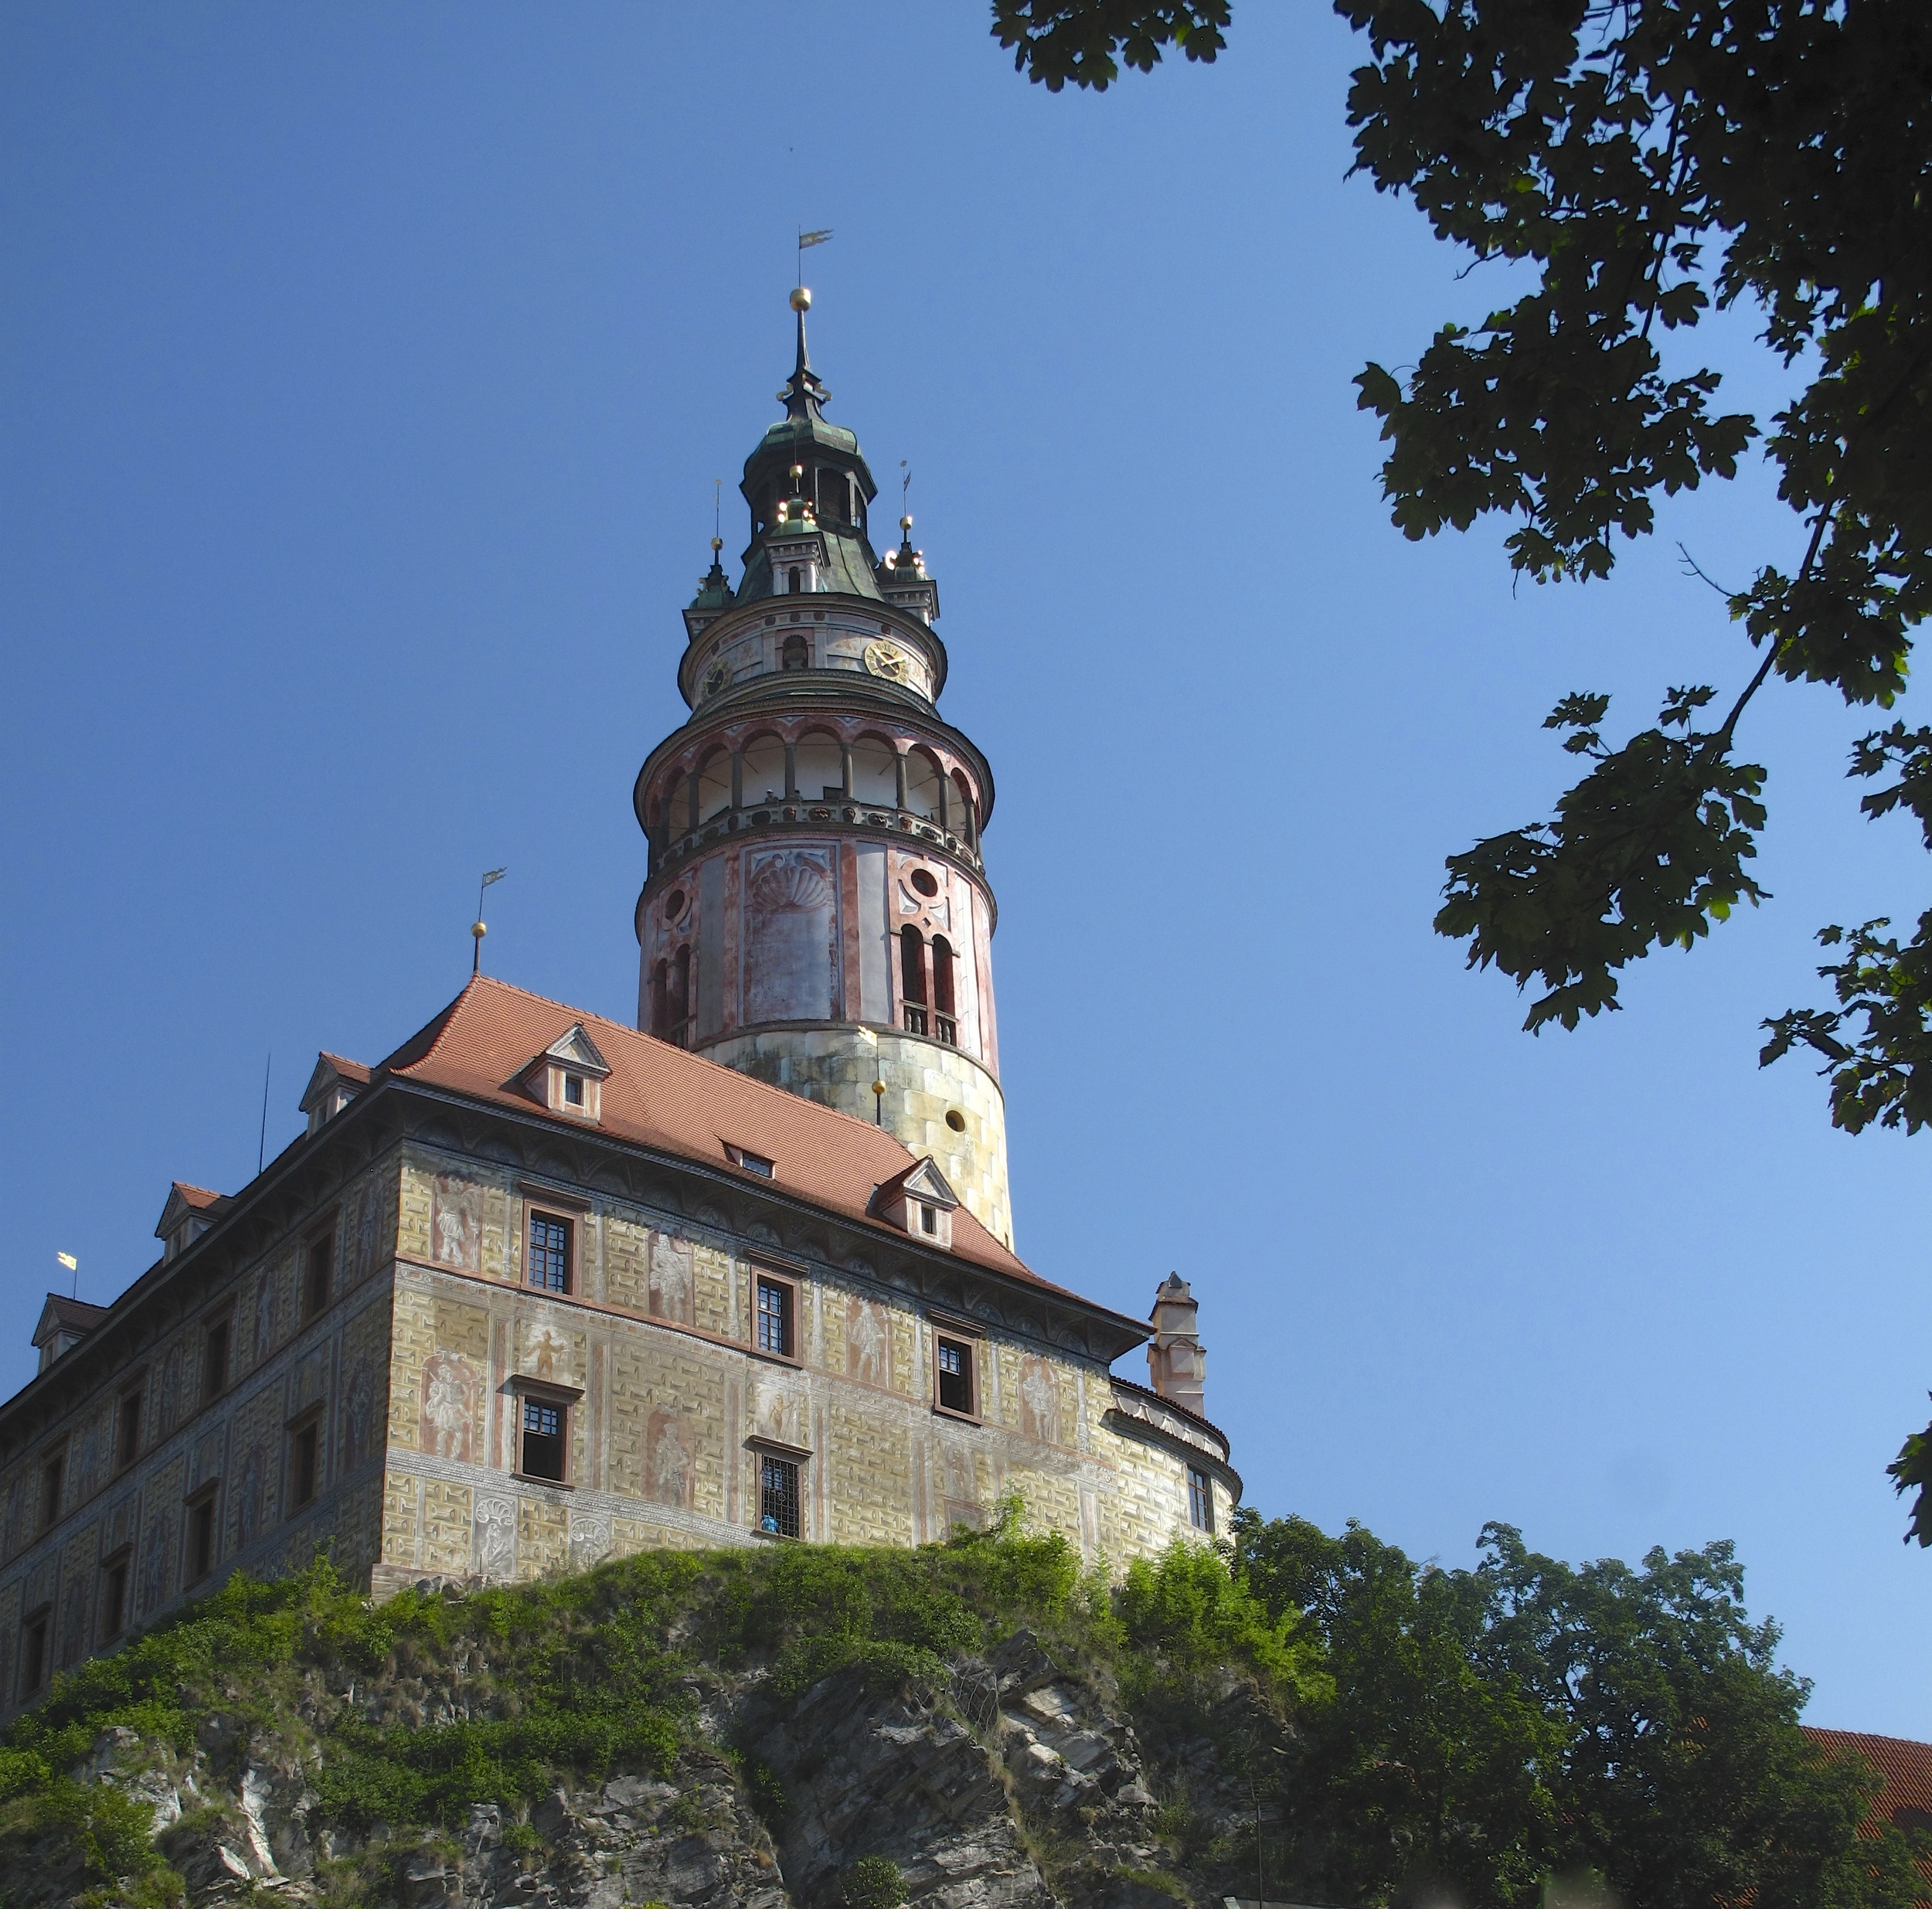 Castle Tower Cesky Krumlov - in the midday sun.